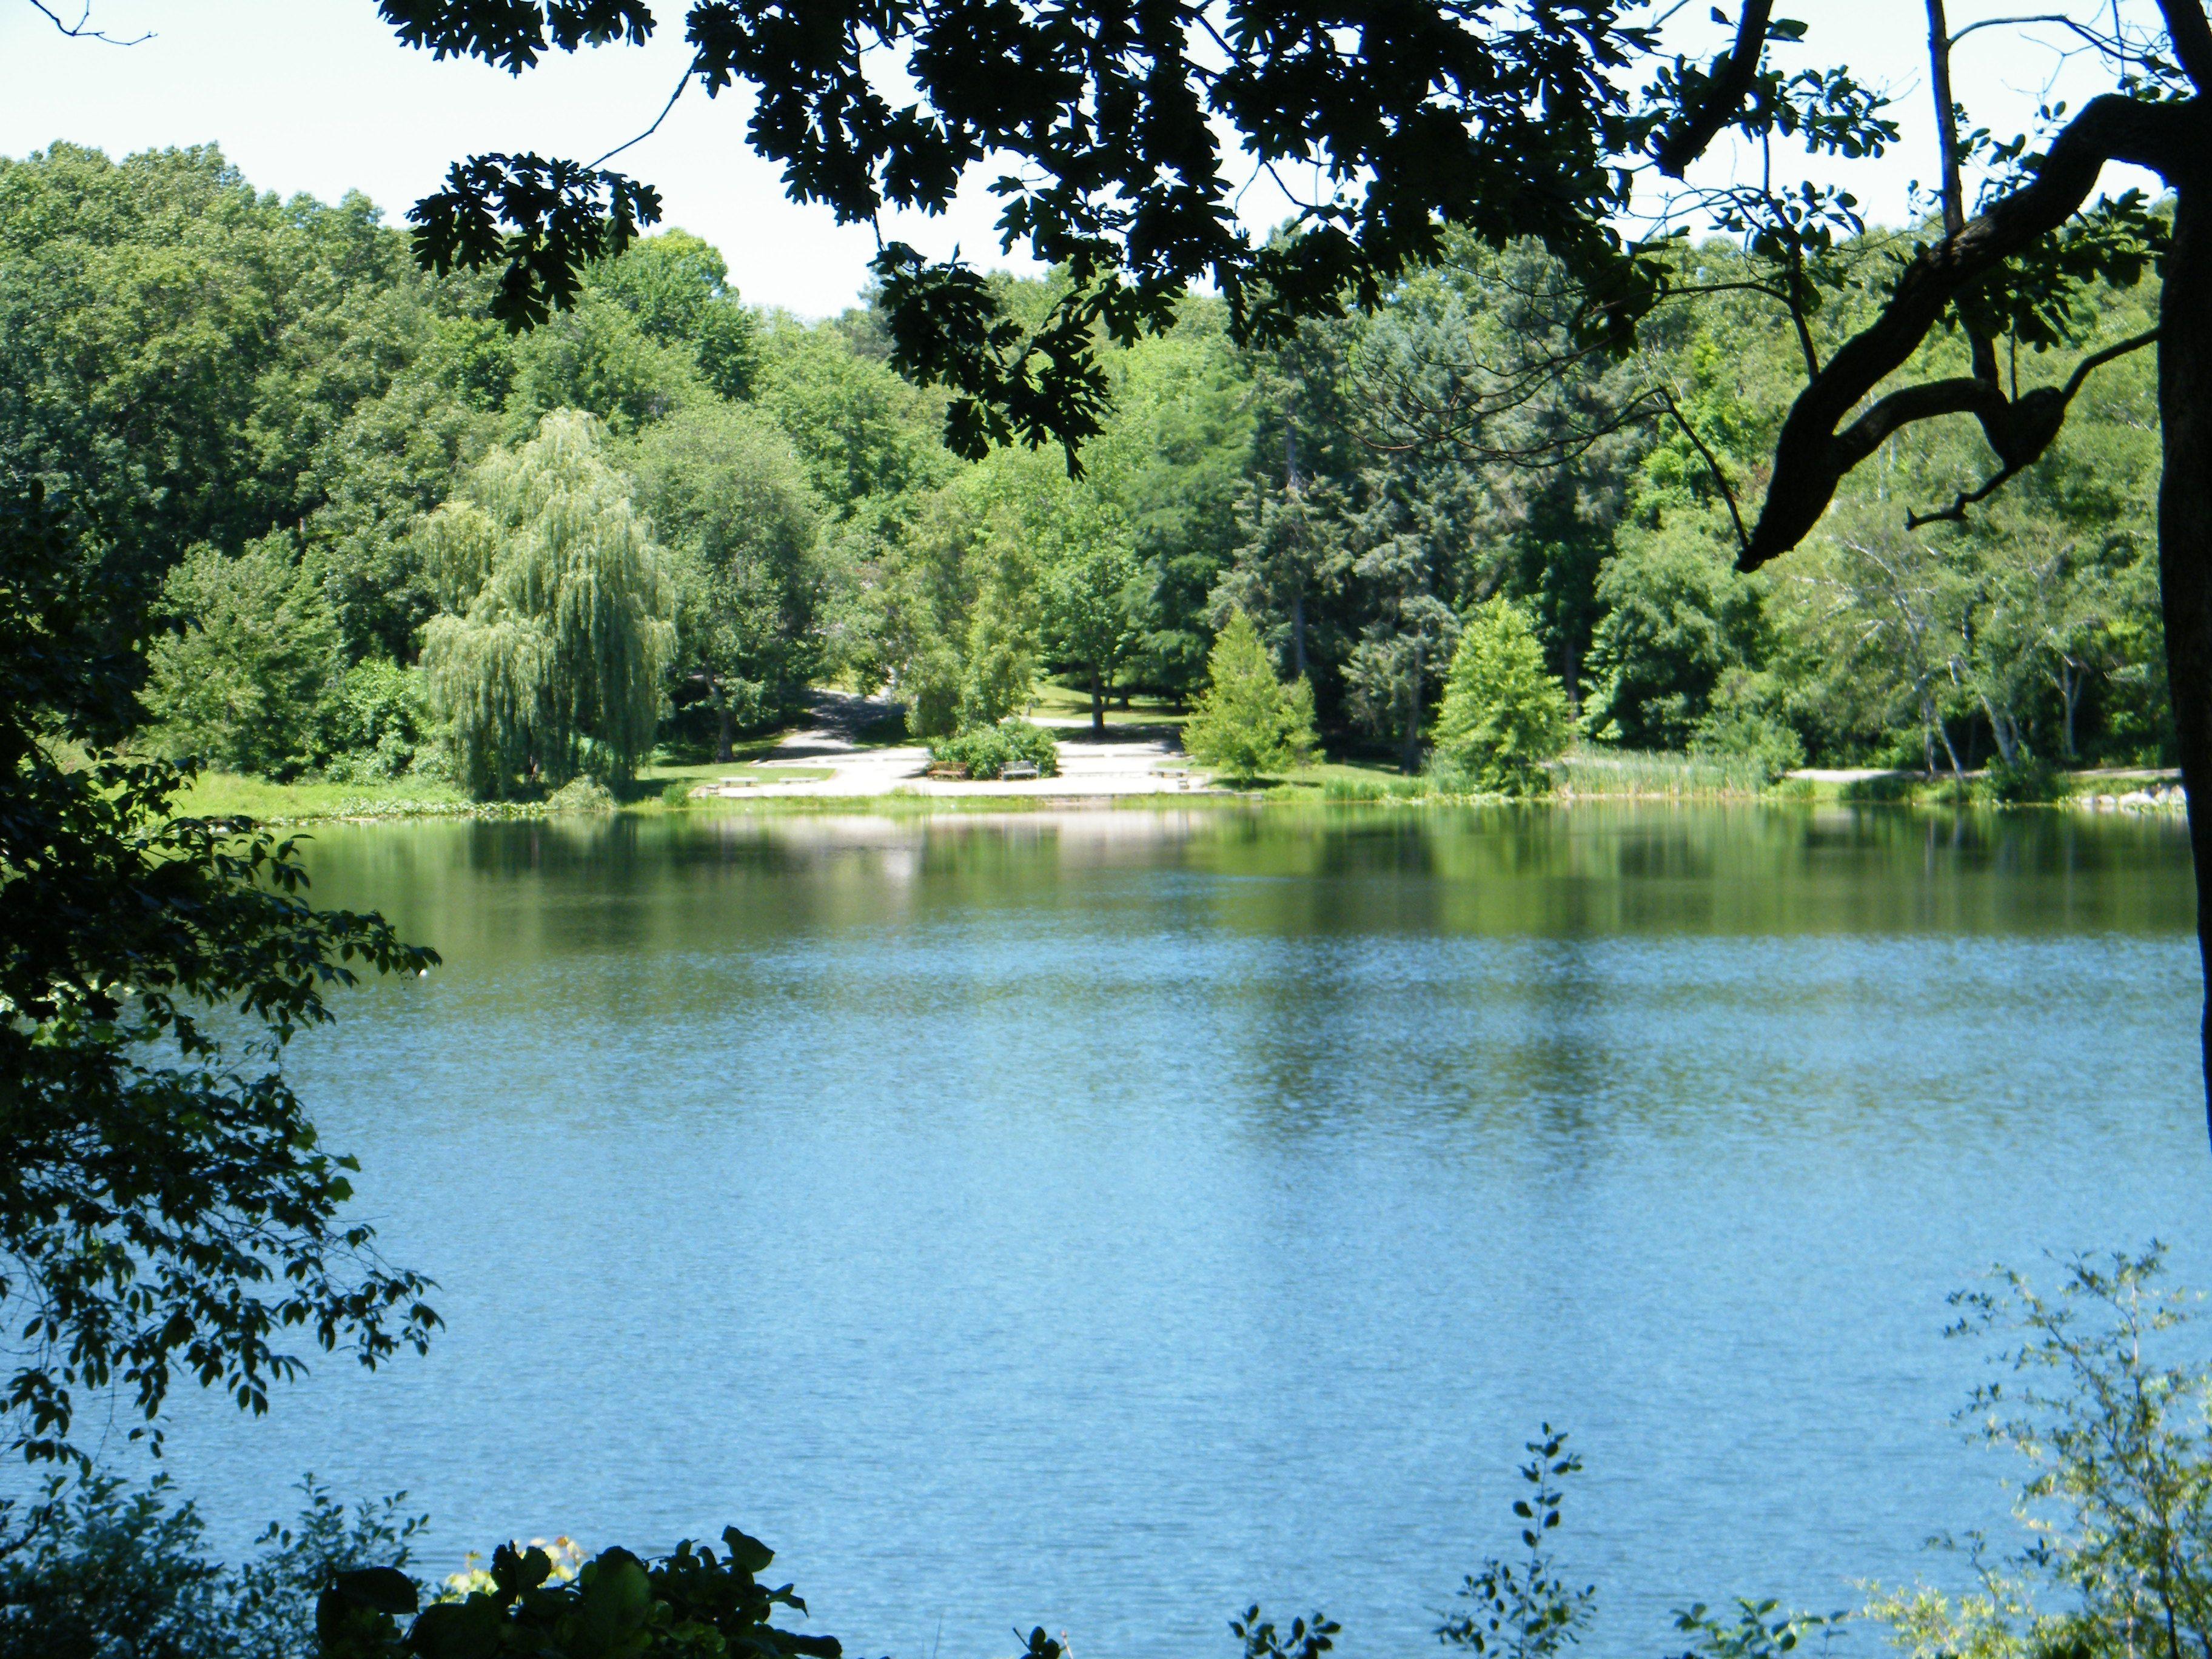 fbb9f53ba7627aa08a2c8d3fafc72be7 - Hidden Lake Gardens In Tipton Michigan